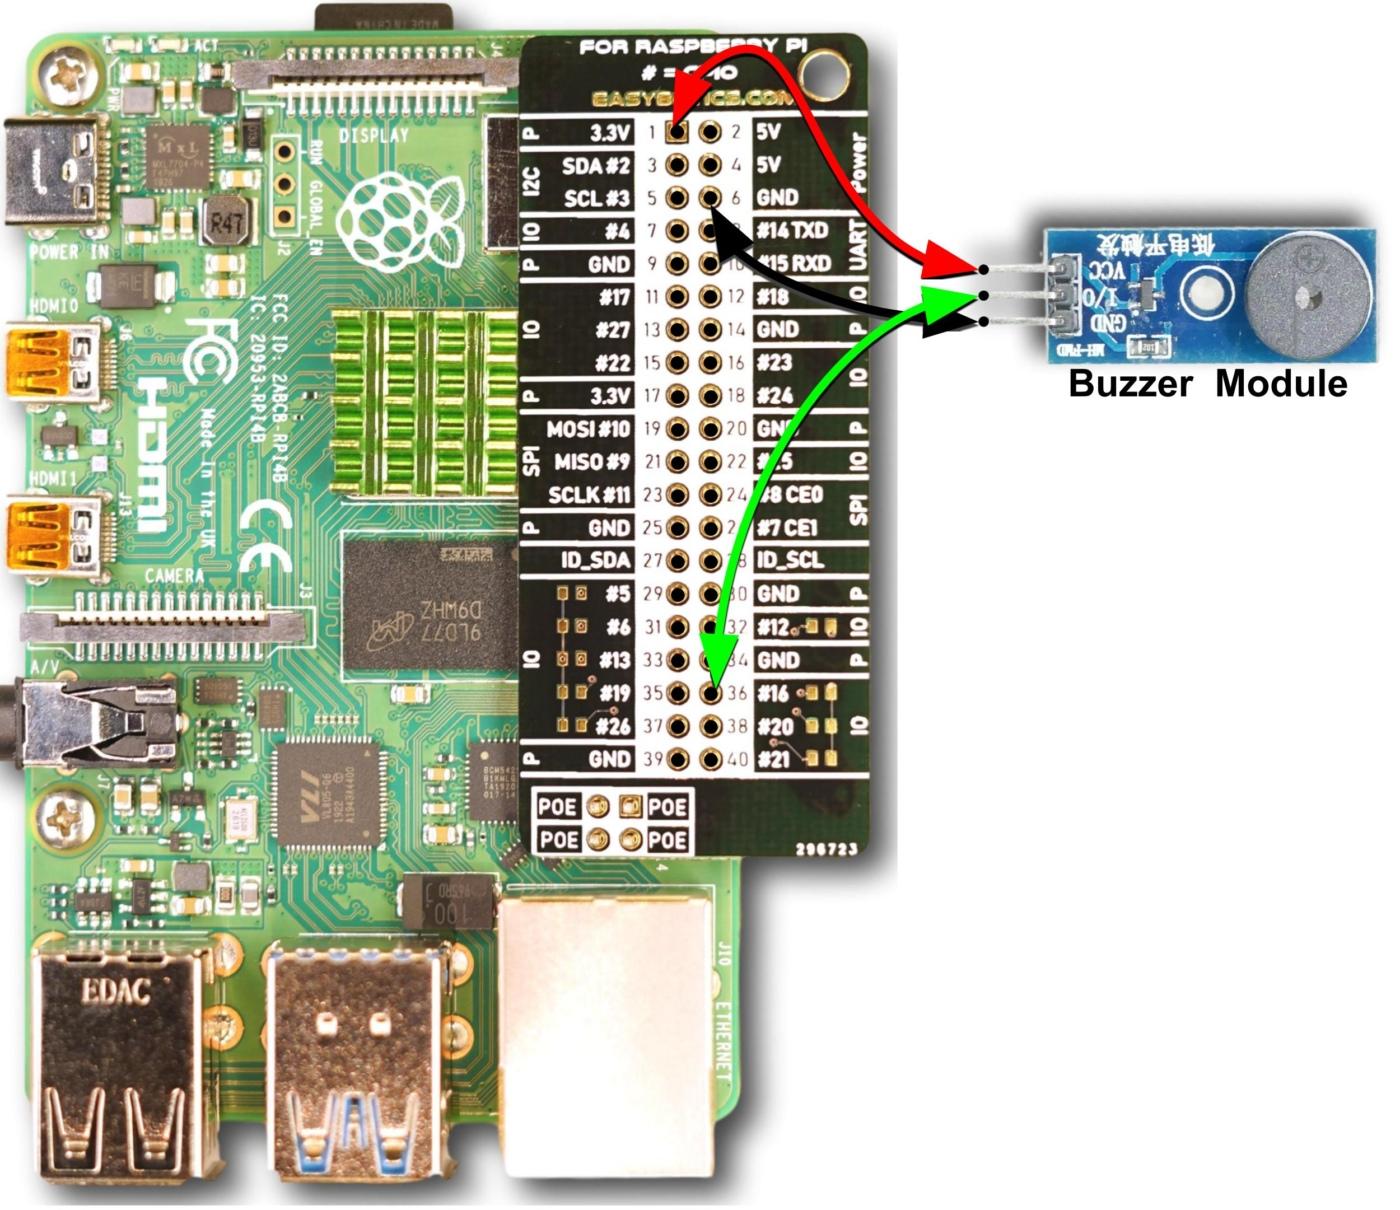 Wiring Diagram Buzzer